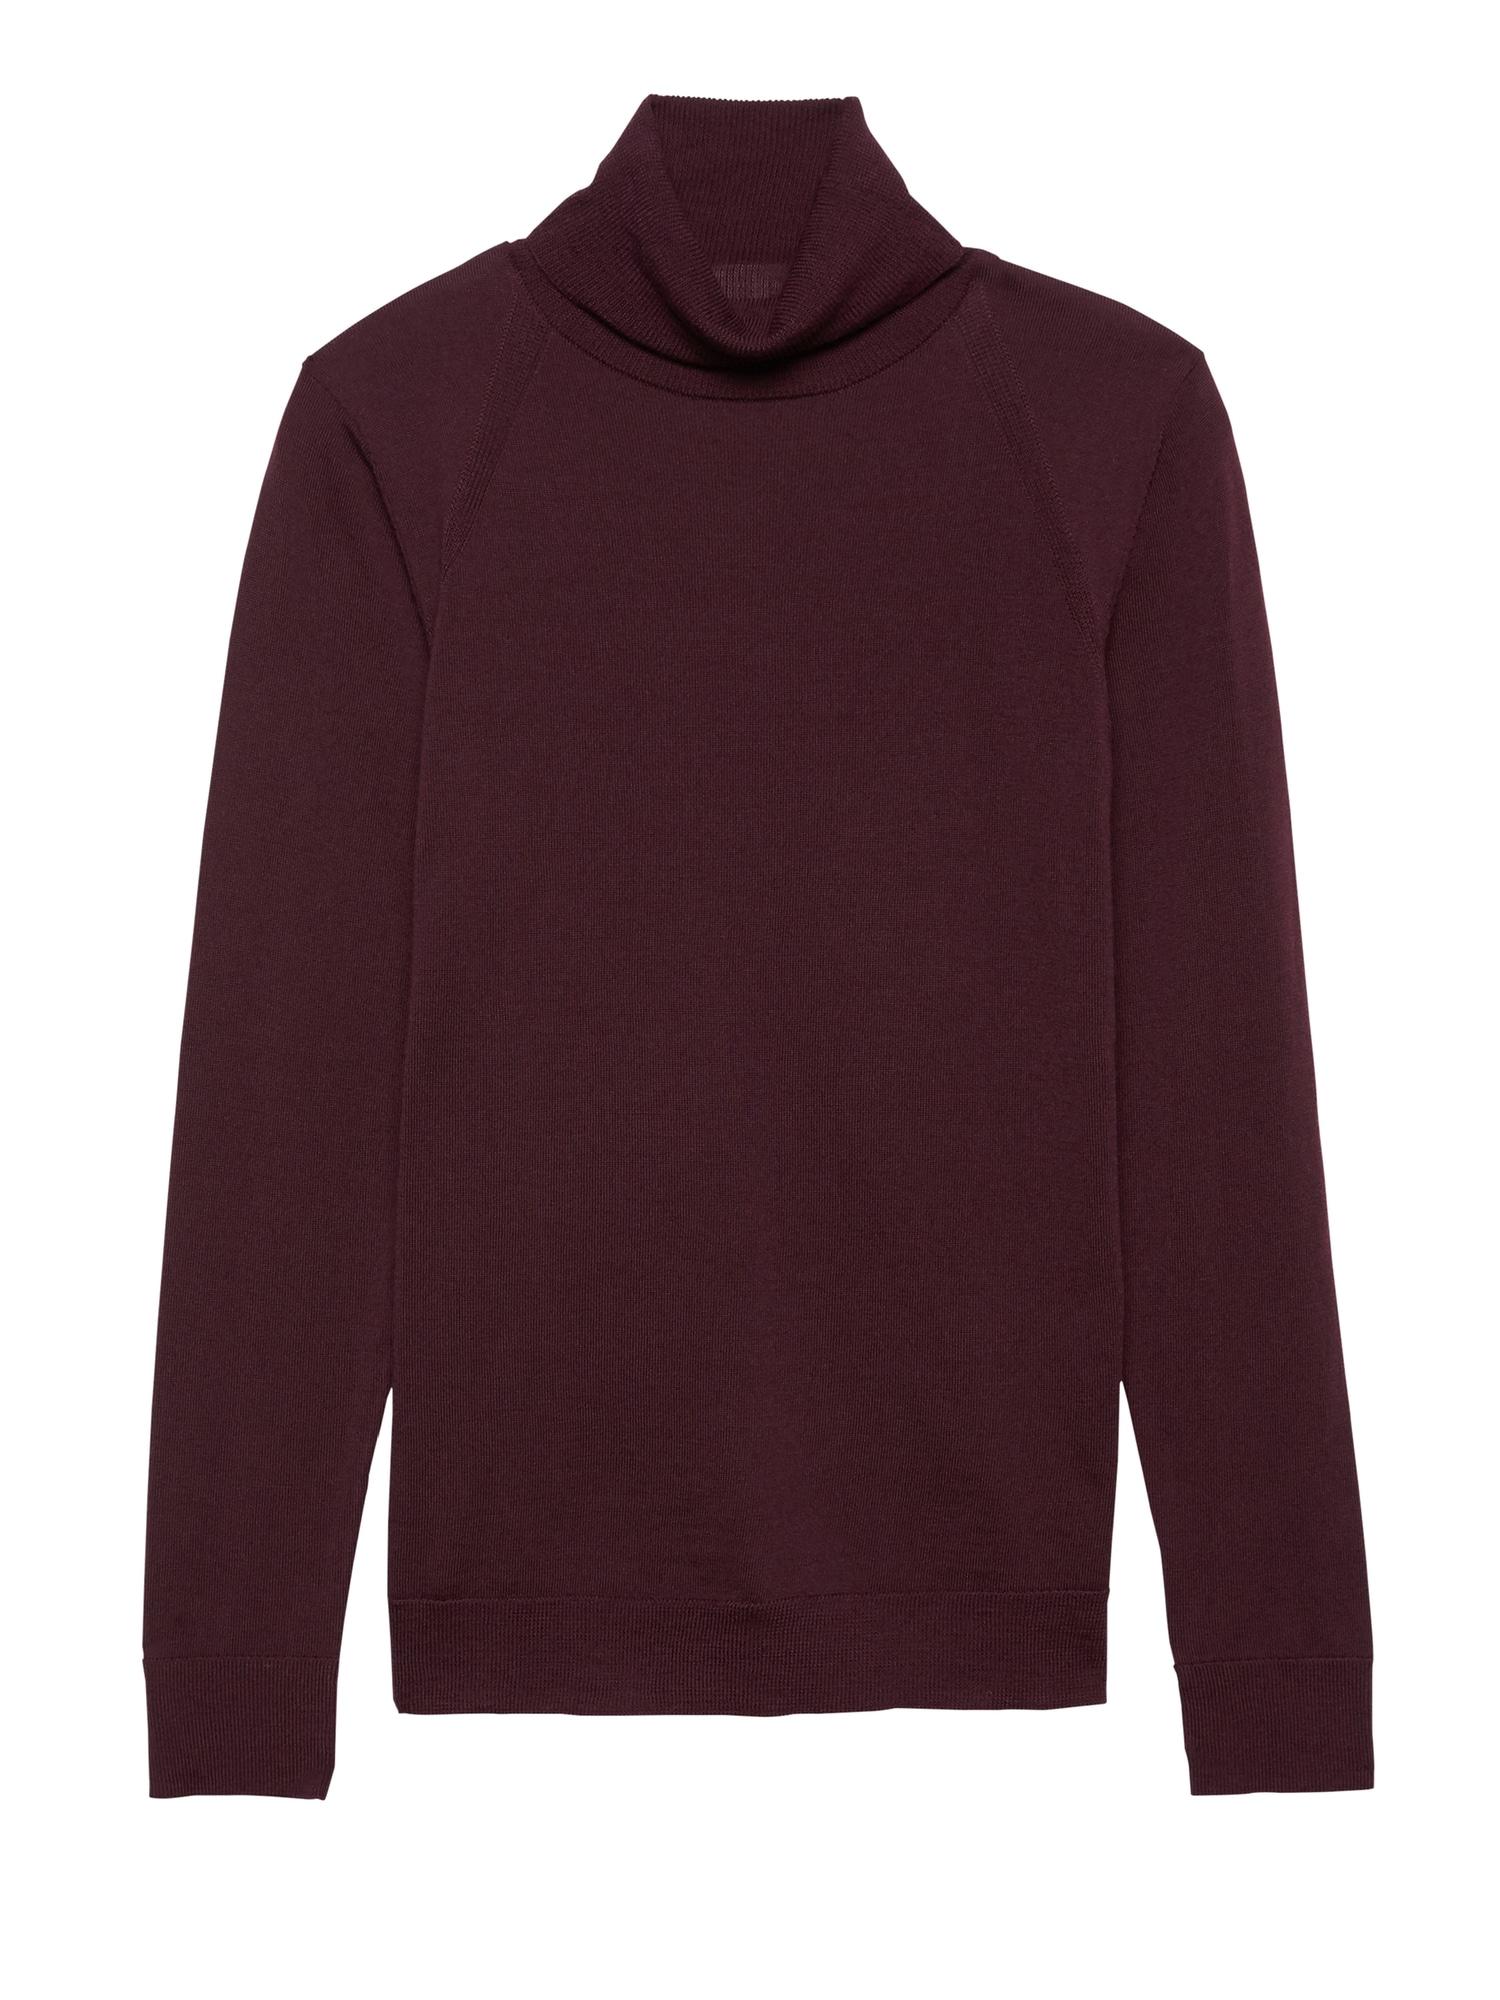 e15bf3560 Washable Merino Turtleneck Sweater